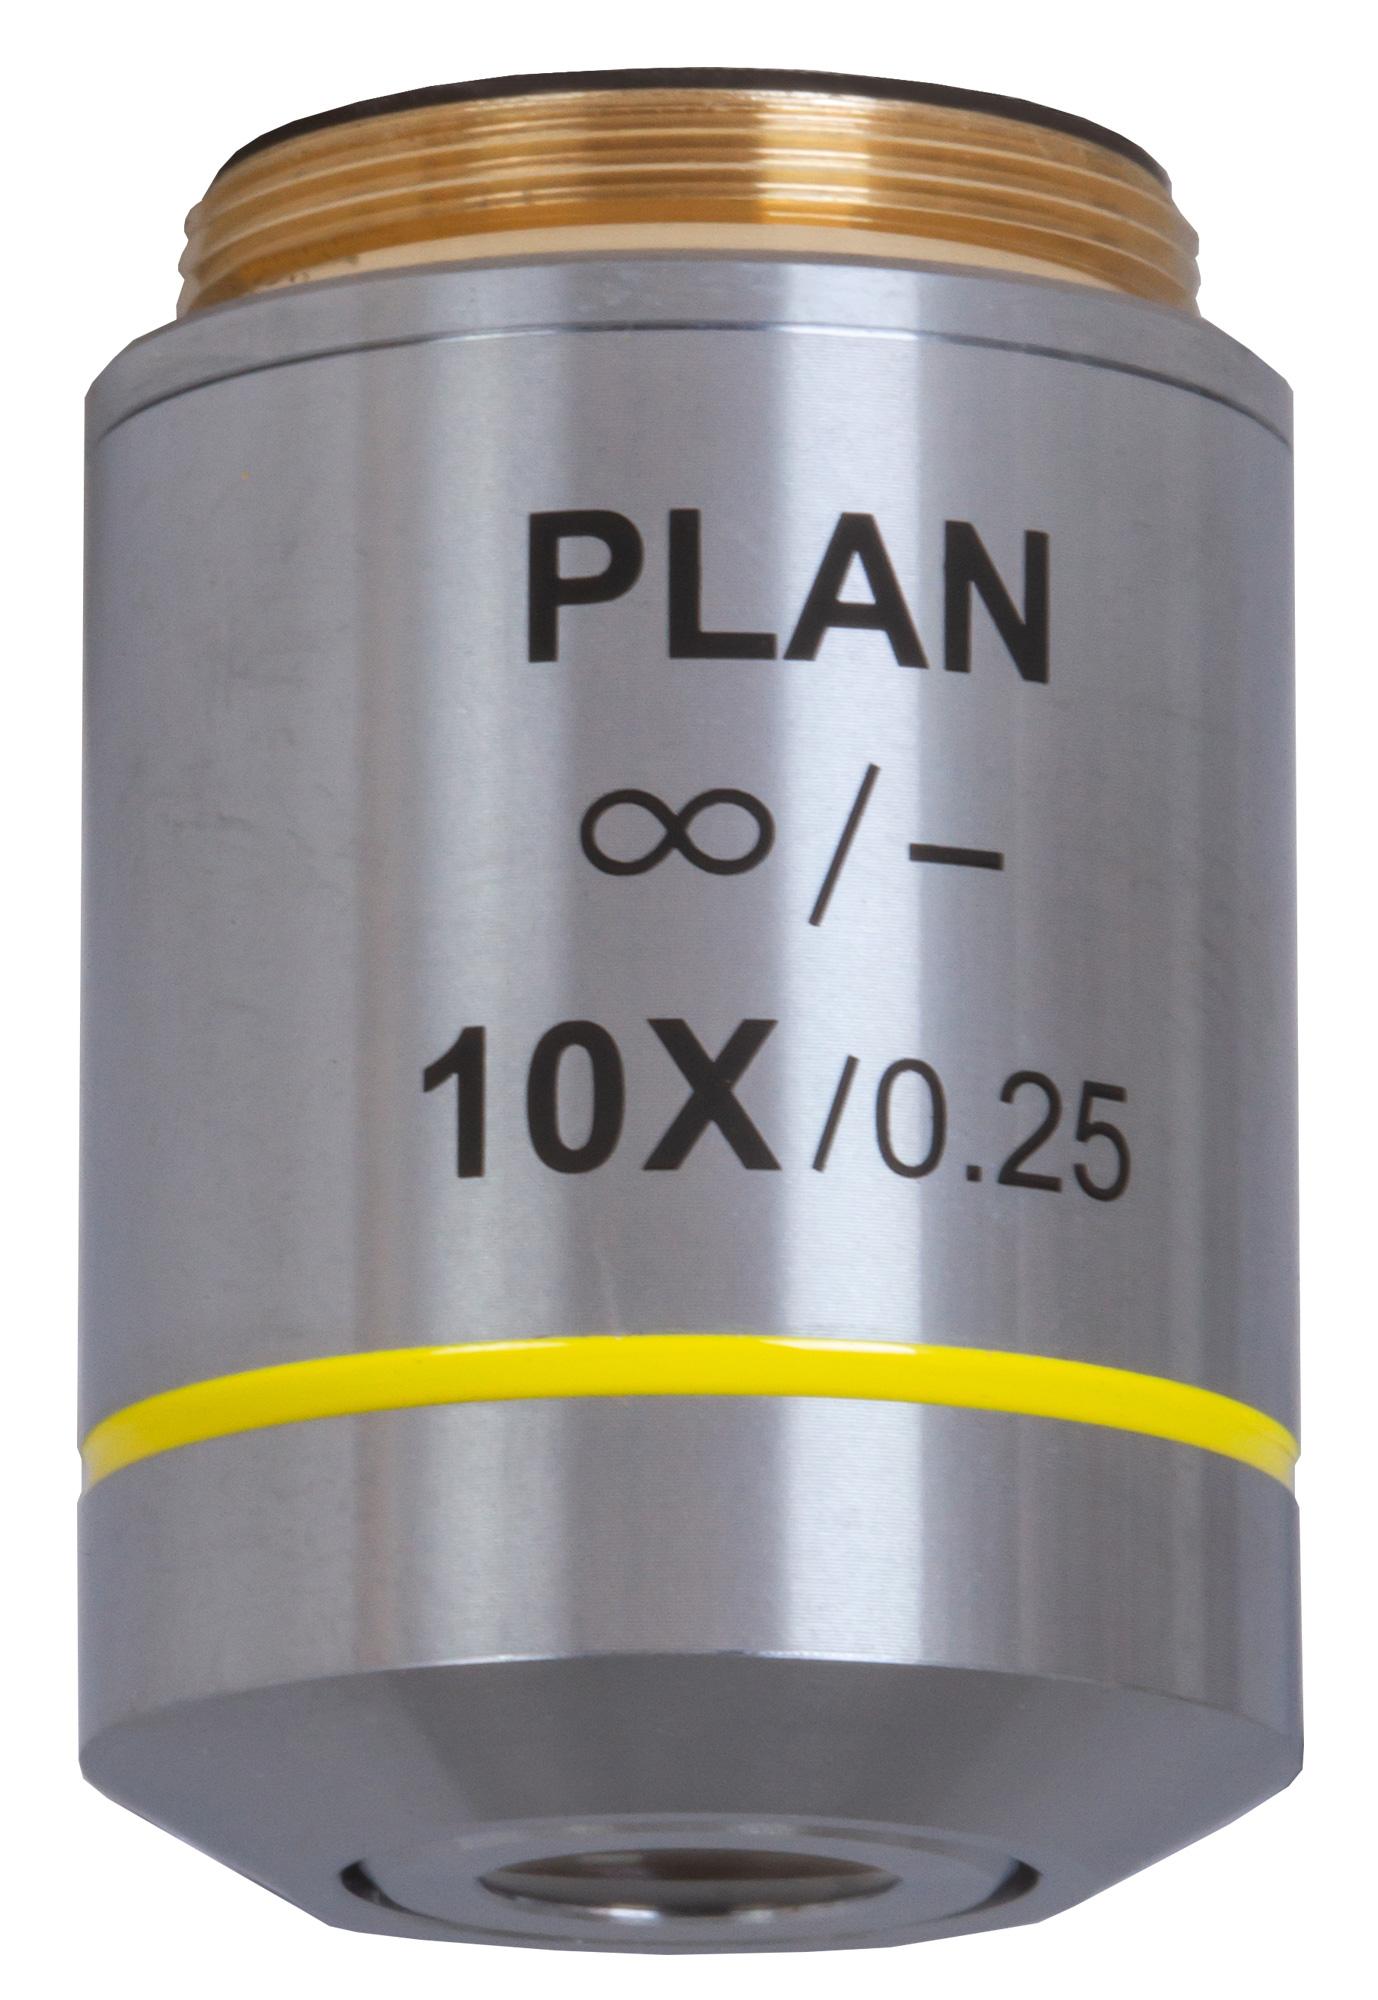 Картинка для Объектив планахроматический Levenhuk (Левенгук) MED 10x/беск